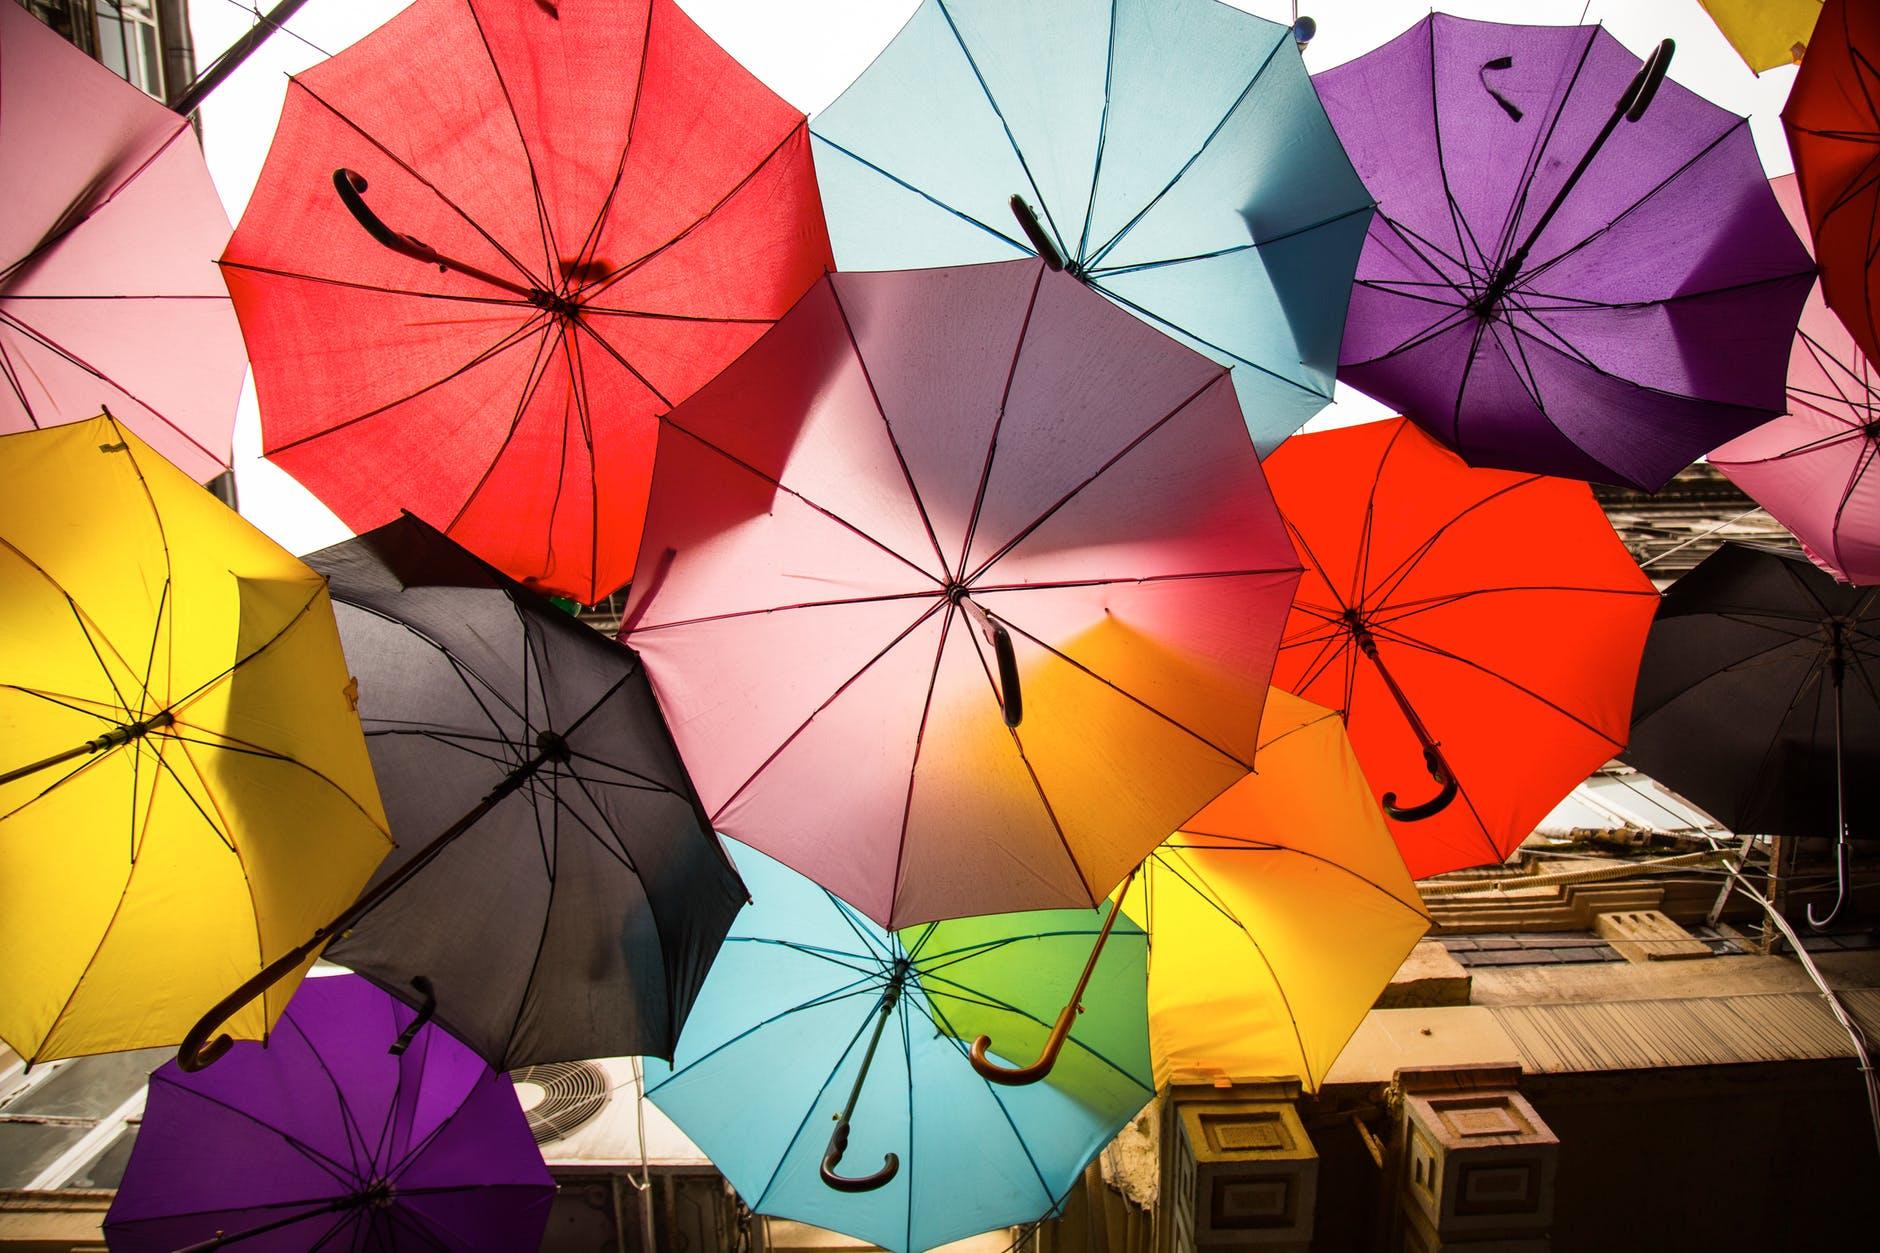 assorted color umbrellas